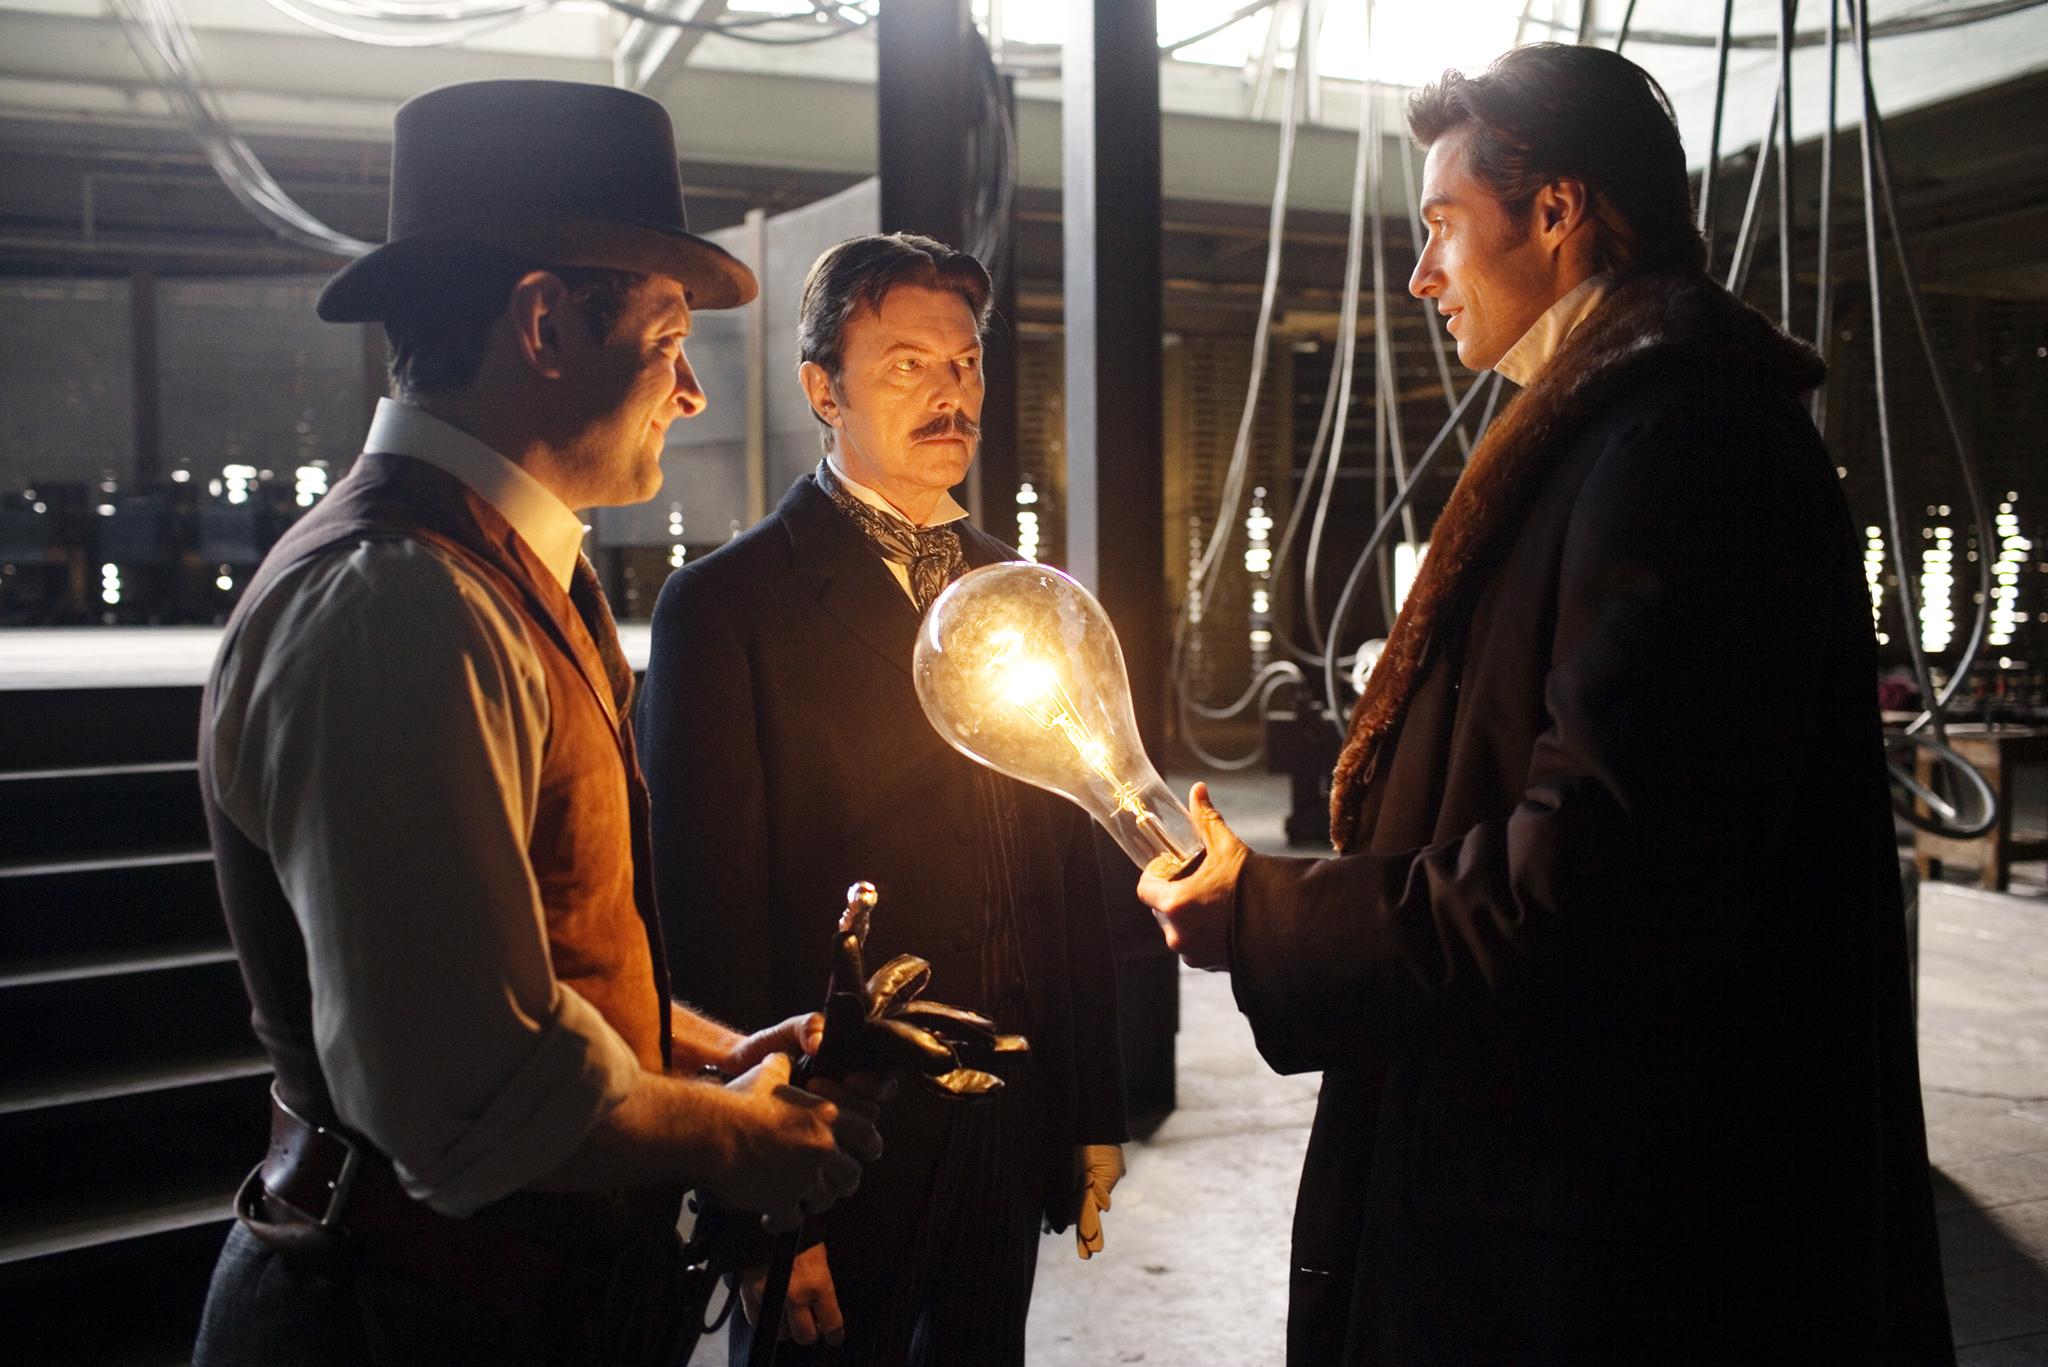 Nikola Tesla, Robert Angier & Mr. Alley